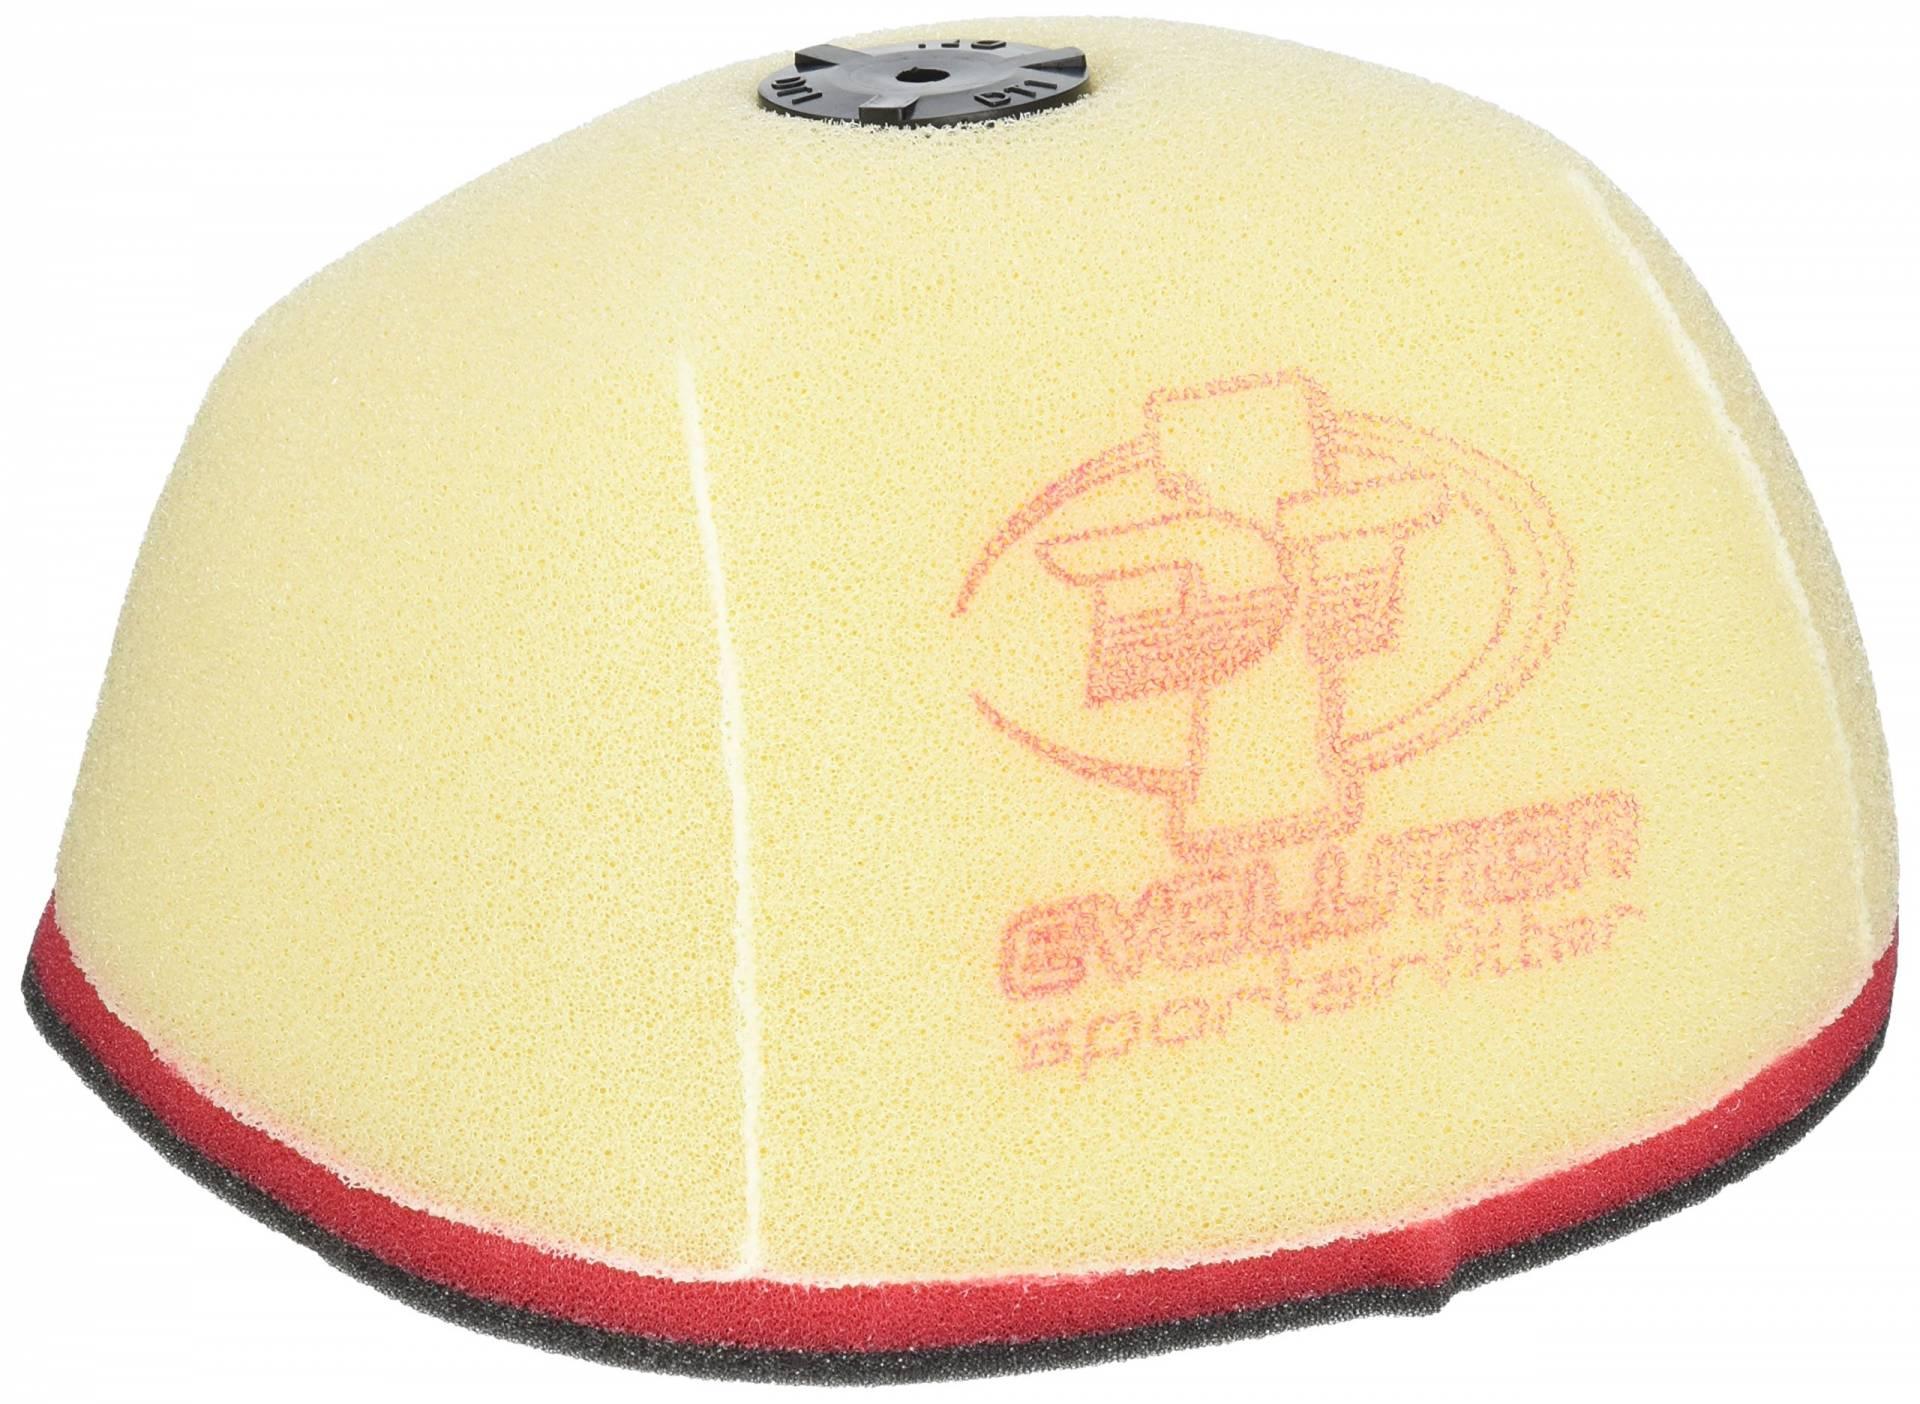 DT-1 EVO-KTM-03-NO Luftfilter Evo Air Power Filter Triple Foam Ktm SX 85 13-17 SX//SX-F 125-450 11-15